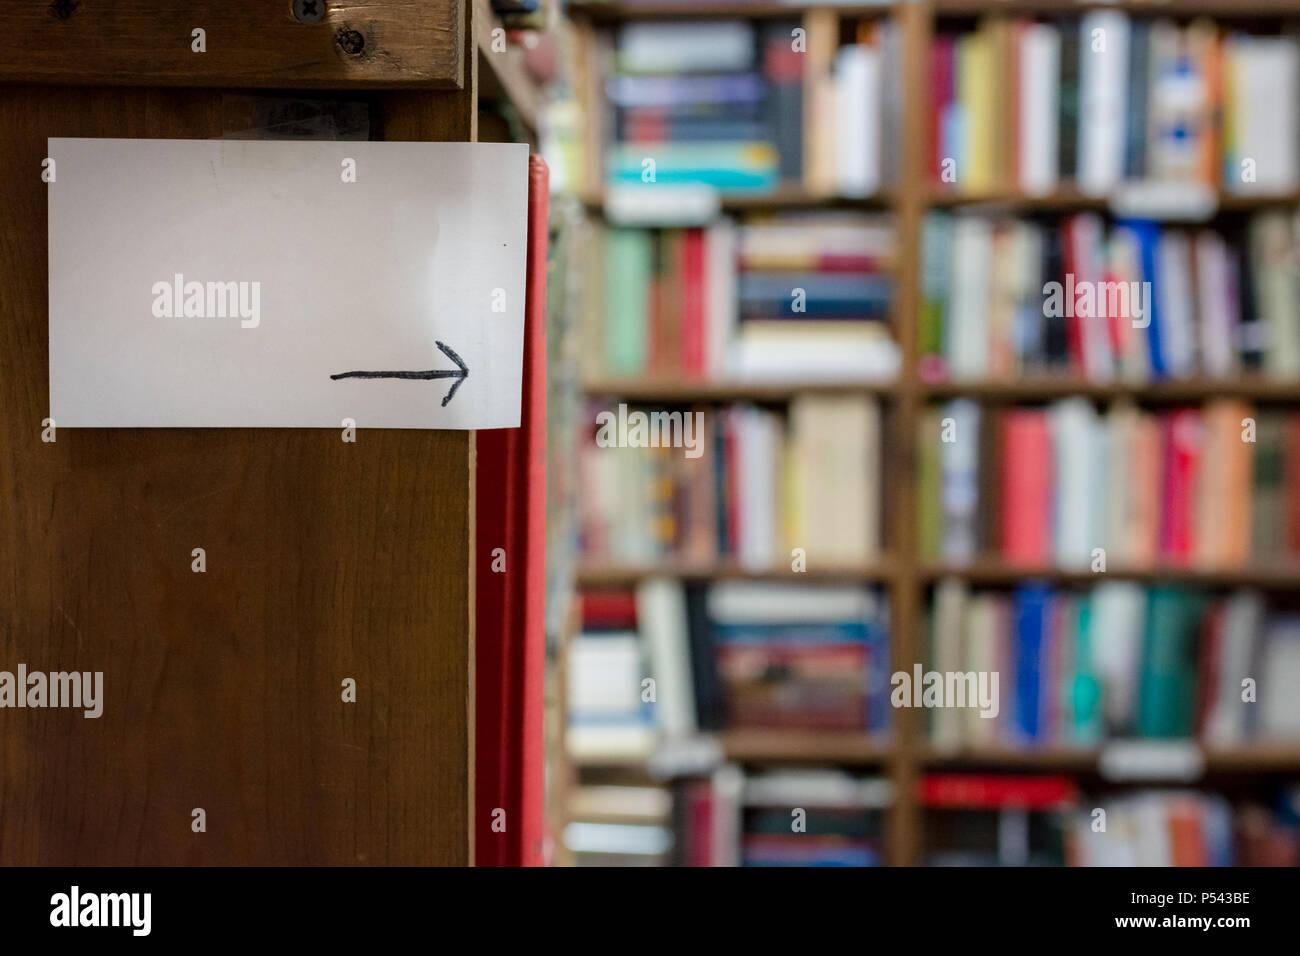 Book shelf sign - Stock Image